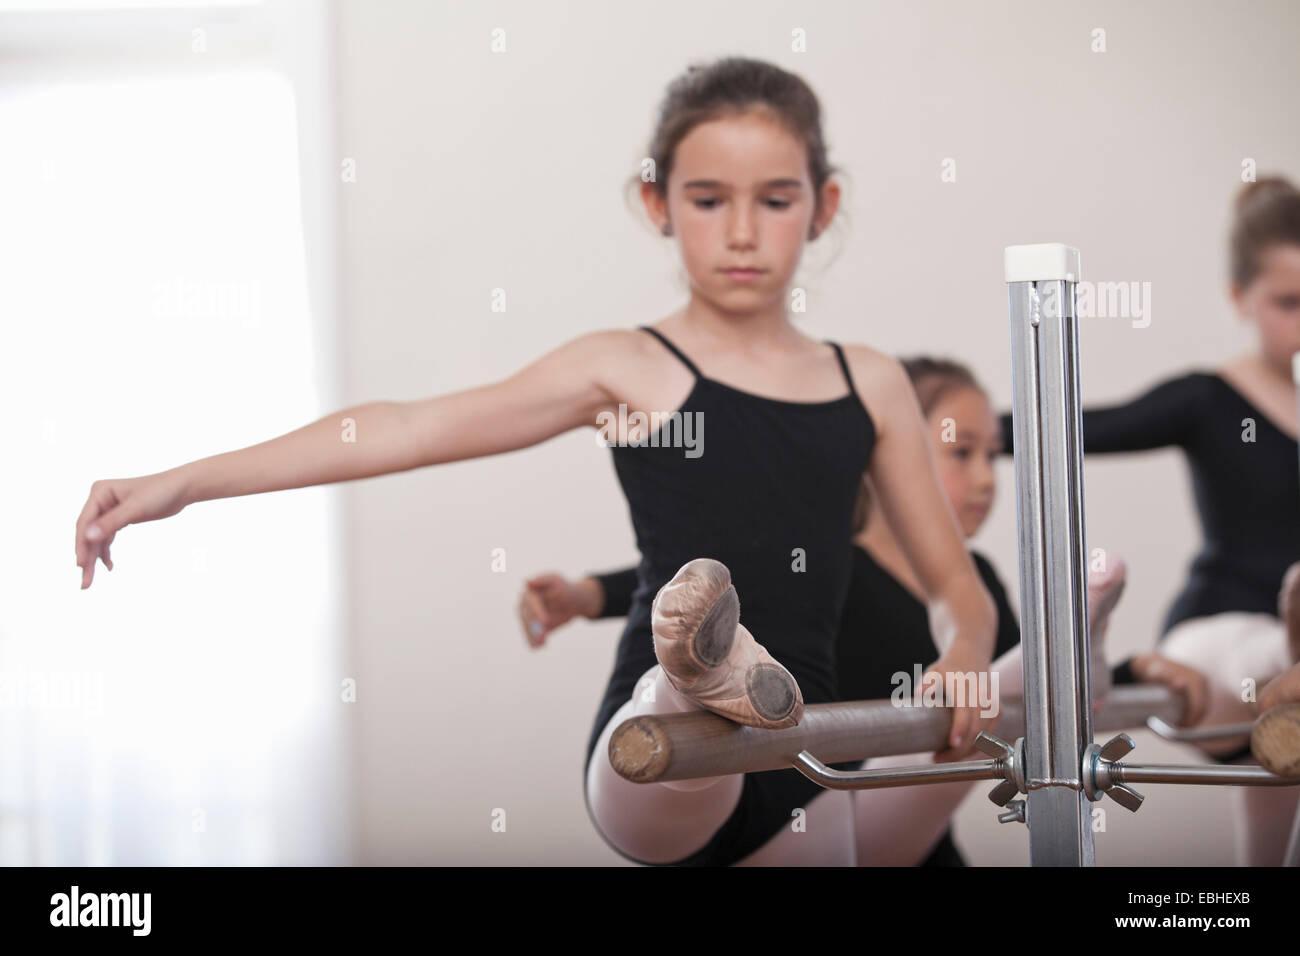 Joven bailarina practicando en barre en ballet school Imagen De Stock